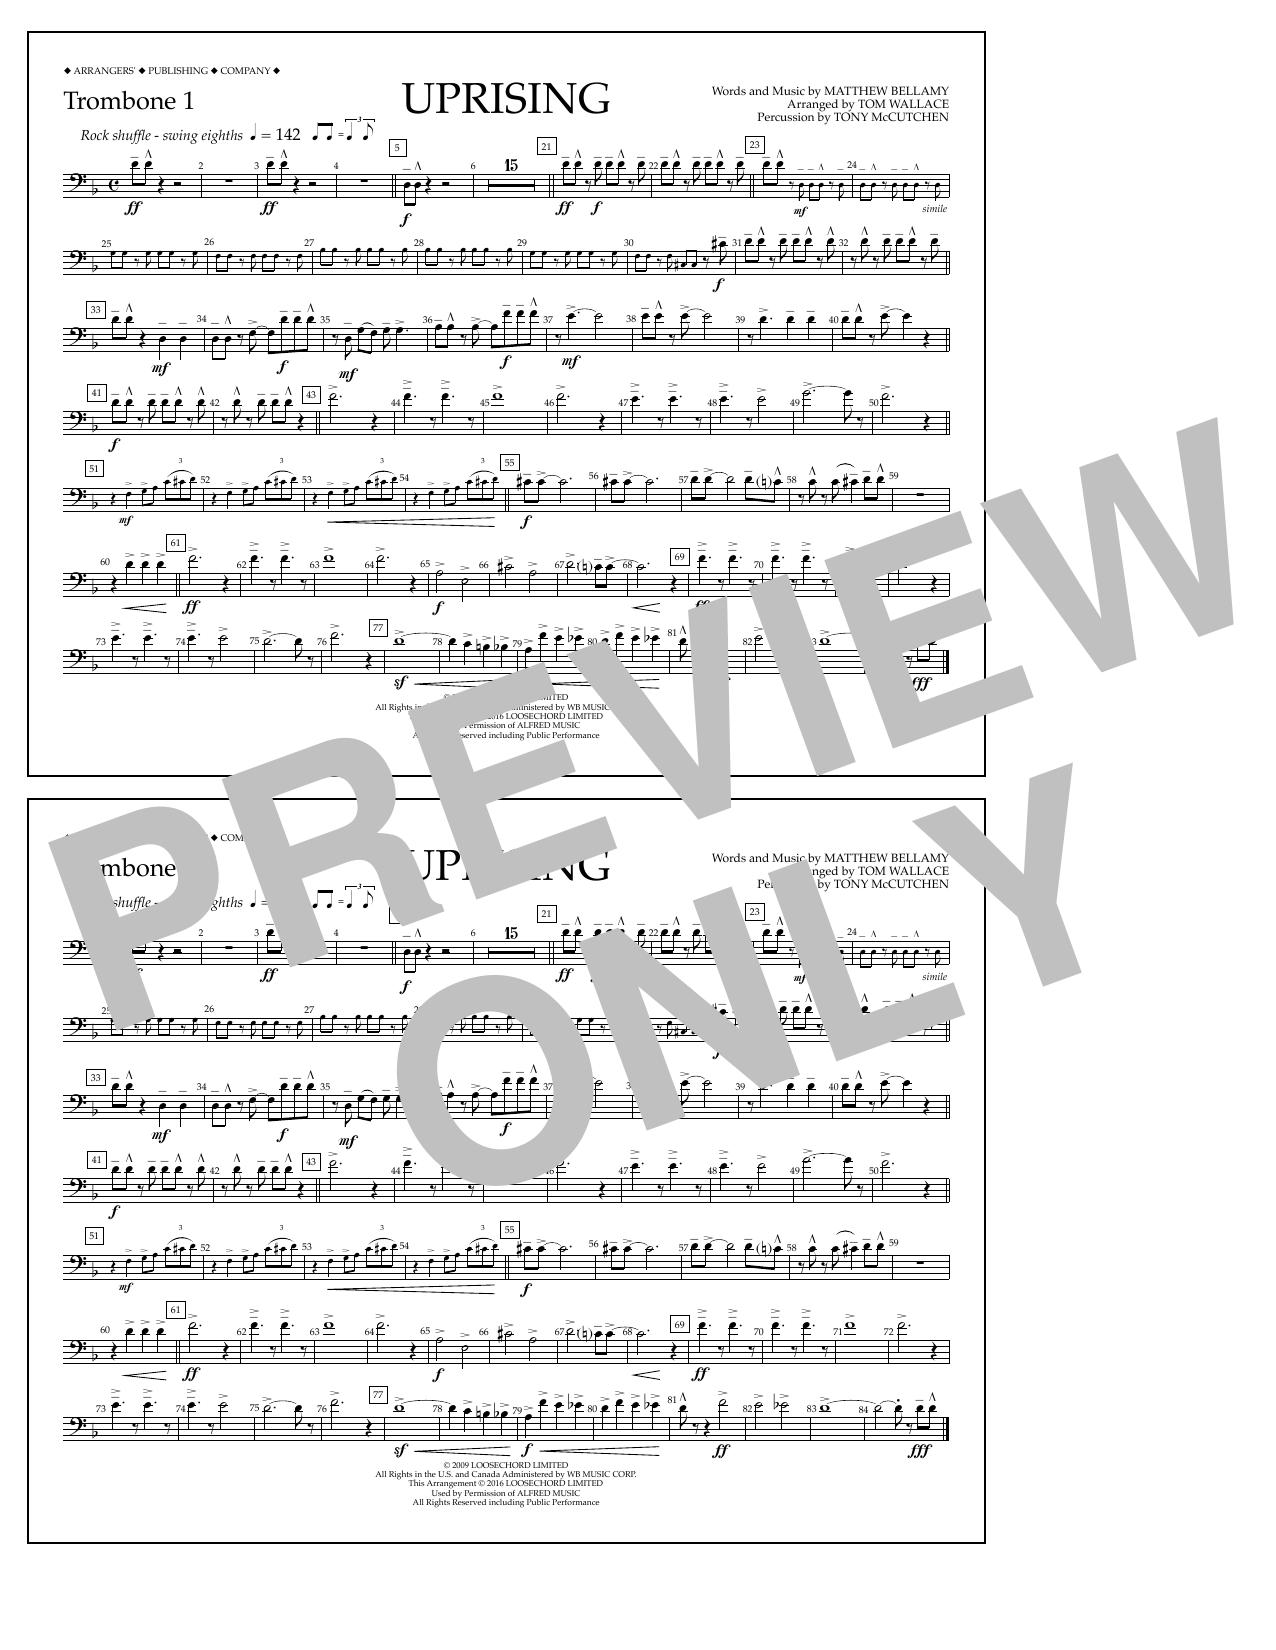 Muse - Uprising - Trombone 1